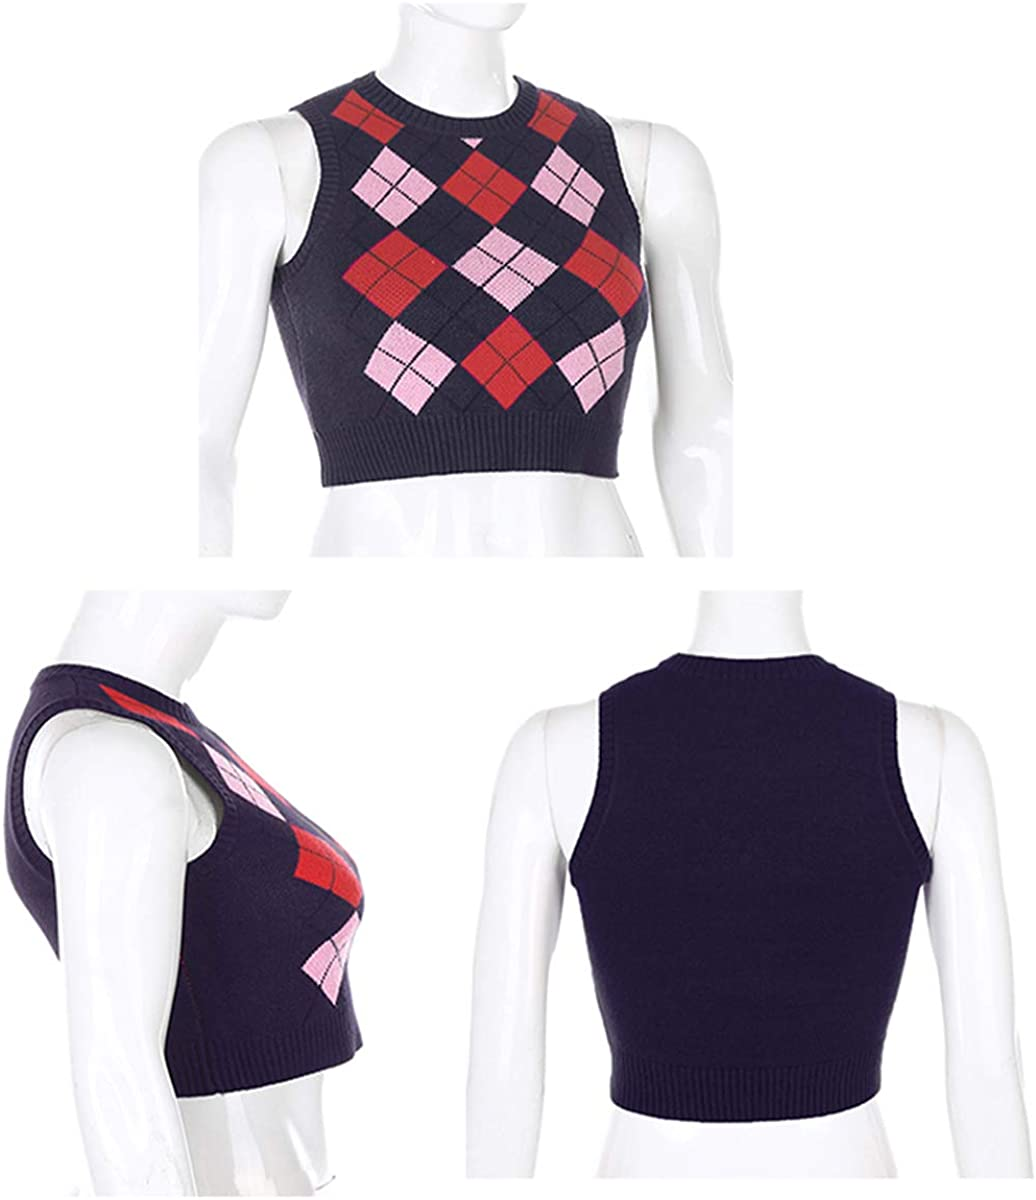 MISSACTIVER Women Argyle Plaid Knitted Crop Sweater Vest Preppy Style V Neck Tank Top Knitwear 90s